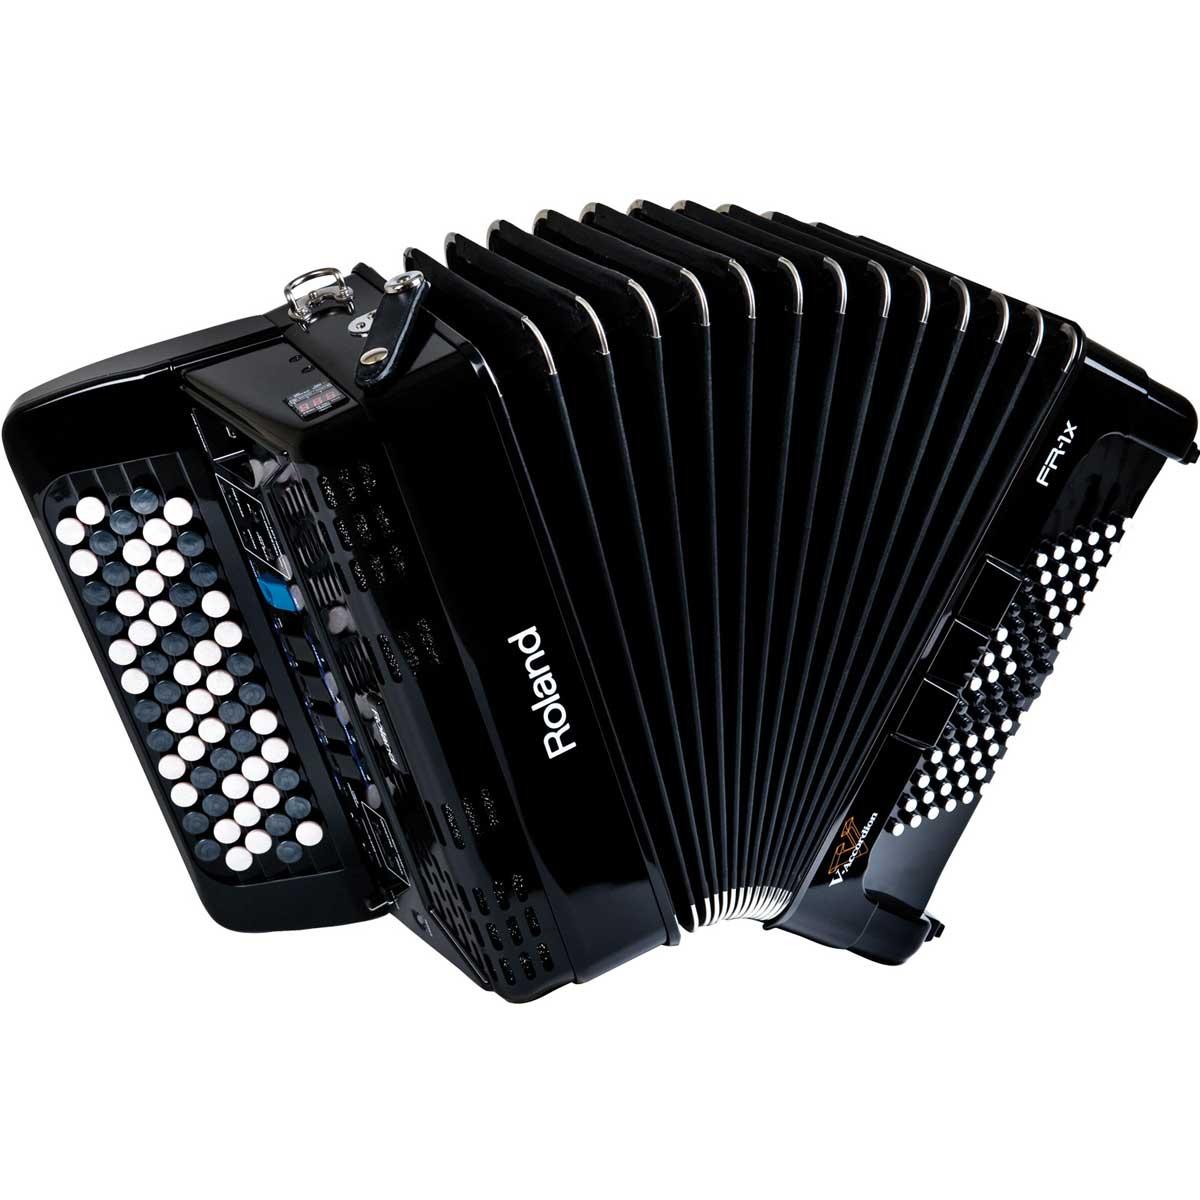 Roland ローランド / V-Accordion FR-1XB BK ブラック Vアコーディオン ボタン鍵盤タイプ【お取り寄せ商品】《納期別途ご案内》【YRK】